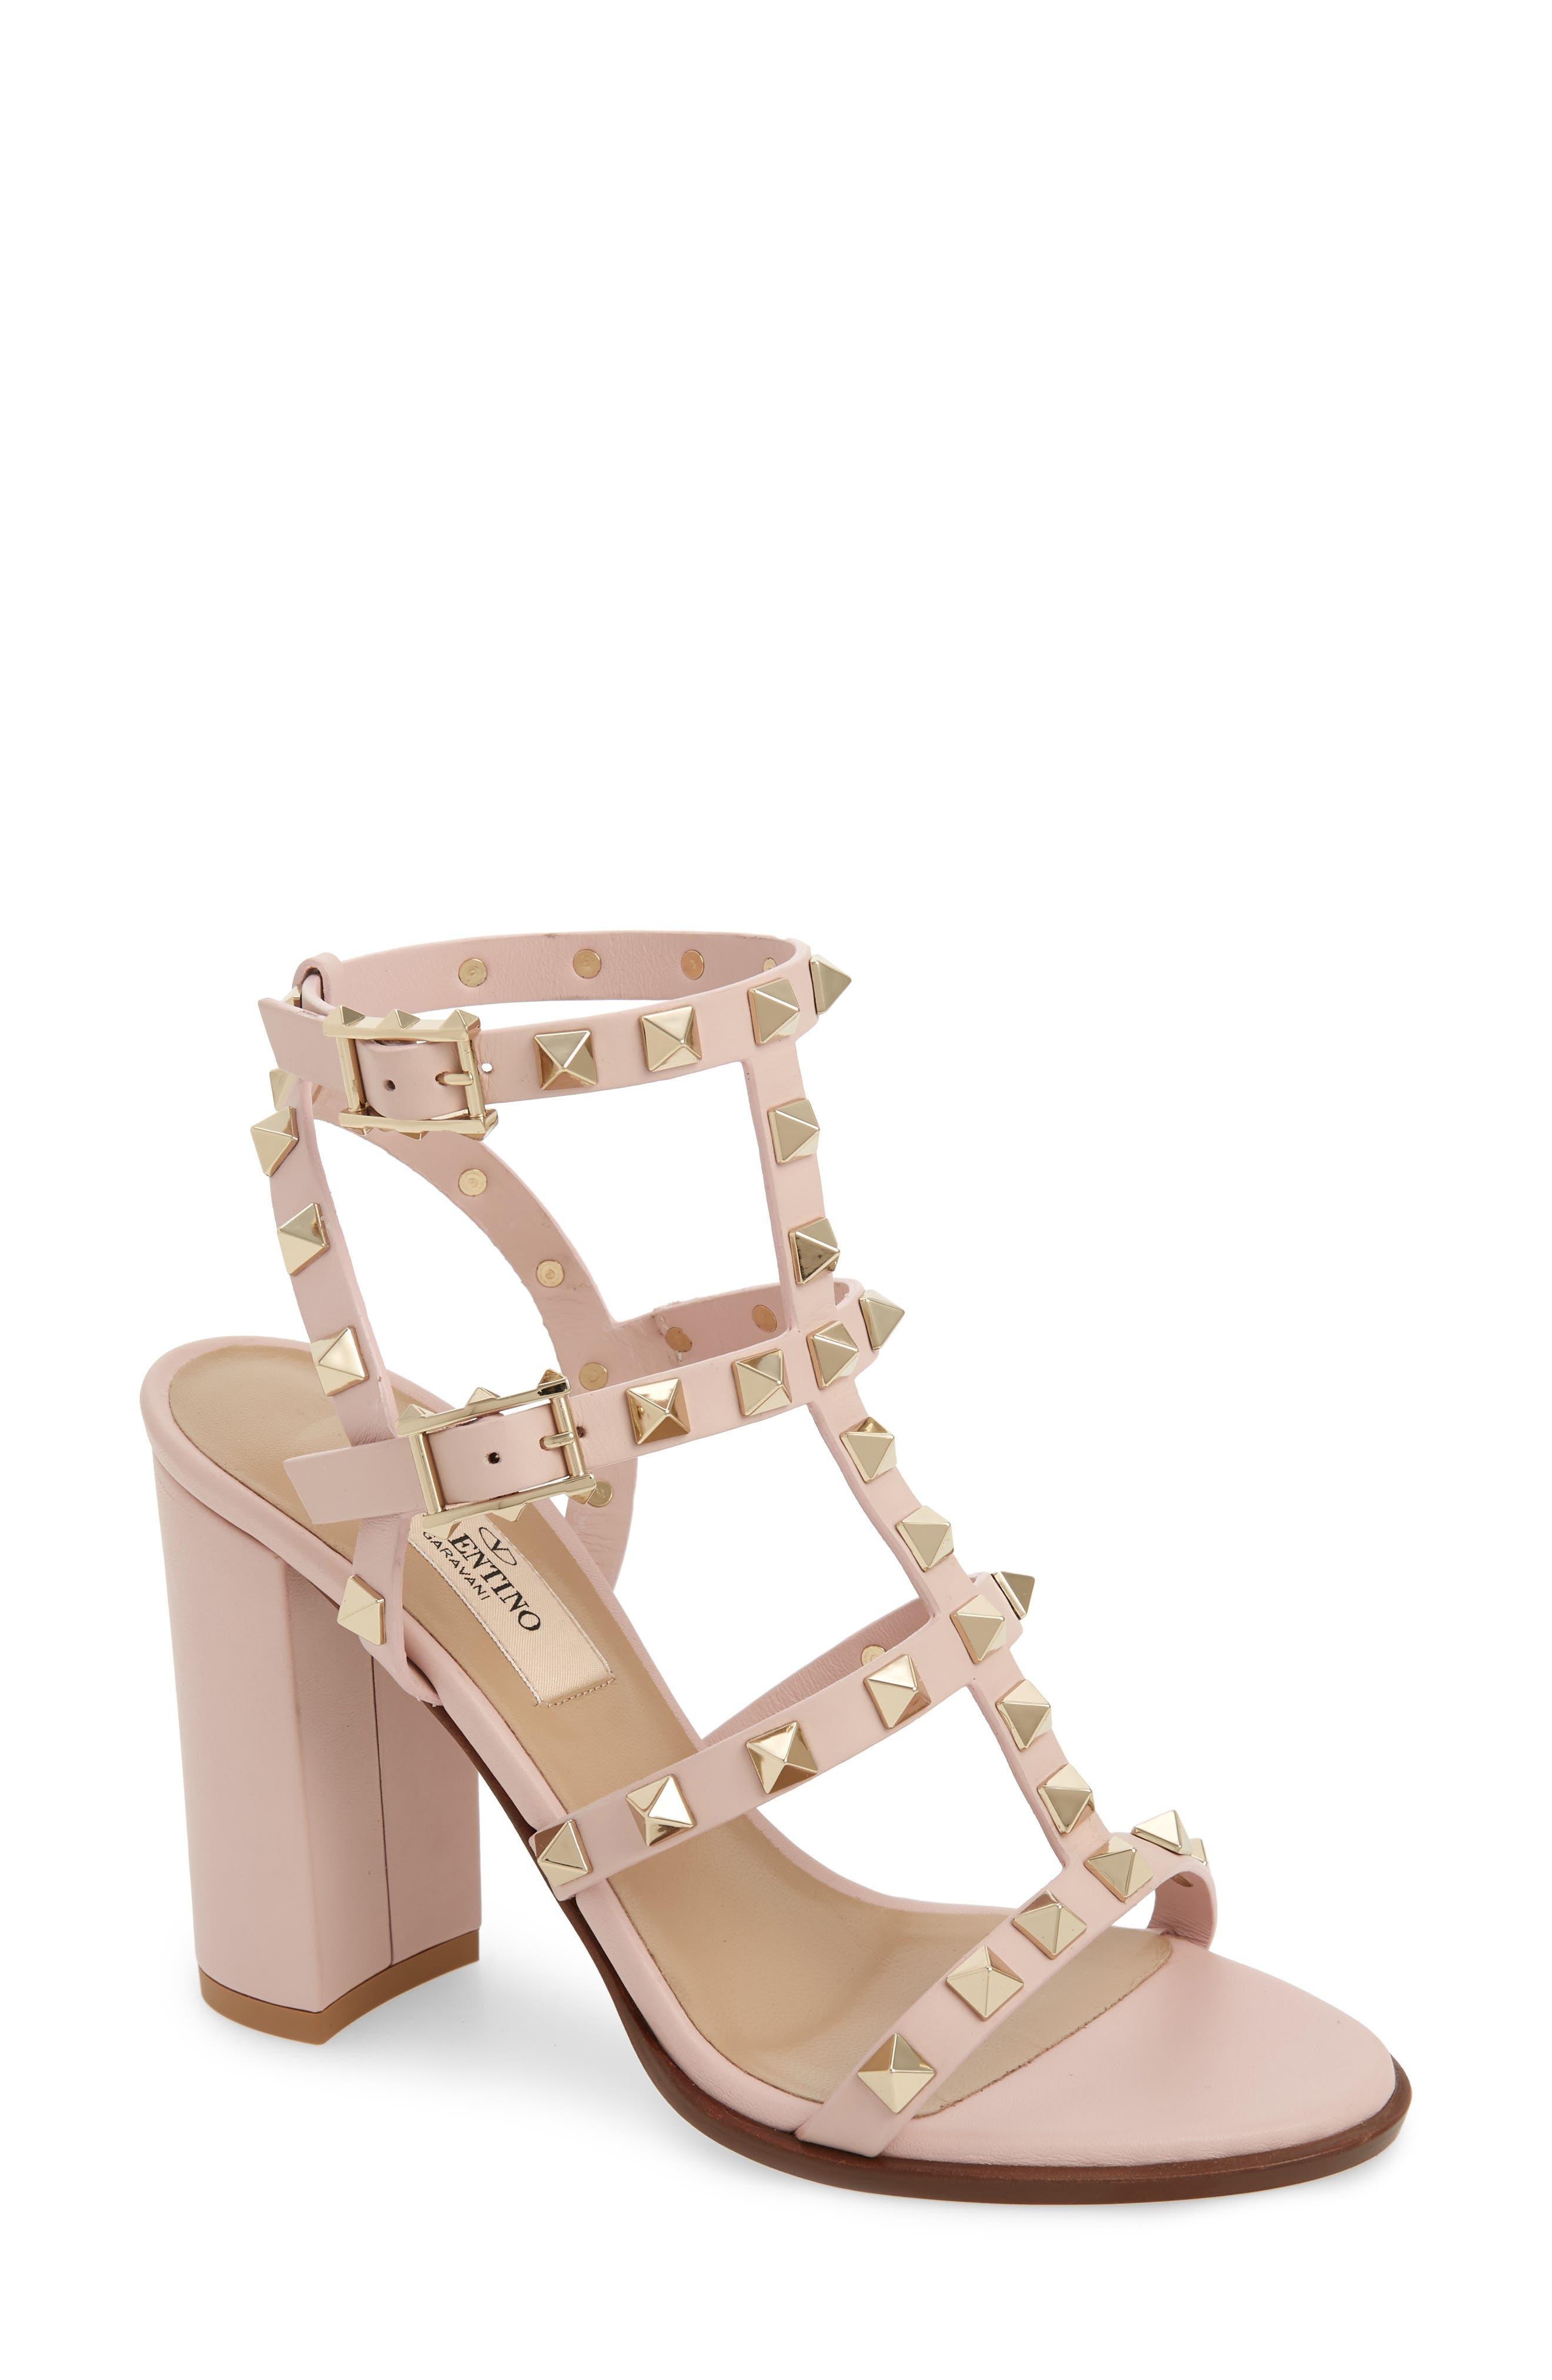 VALENTINO GARAVANI, Rockstud Block Heel Sandal, Main thumbnail 1, color, WATER ROSE